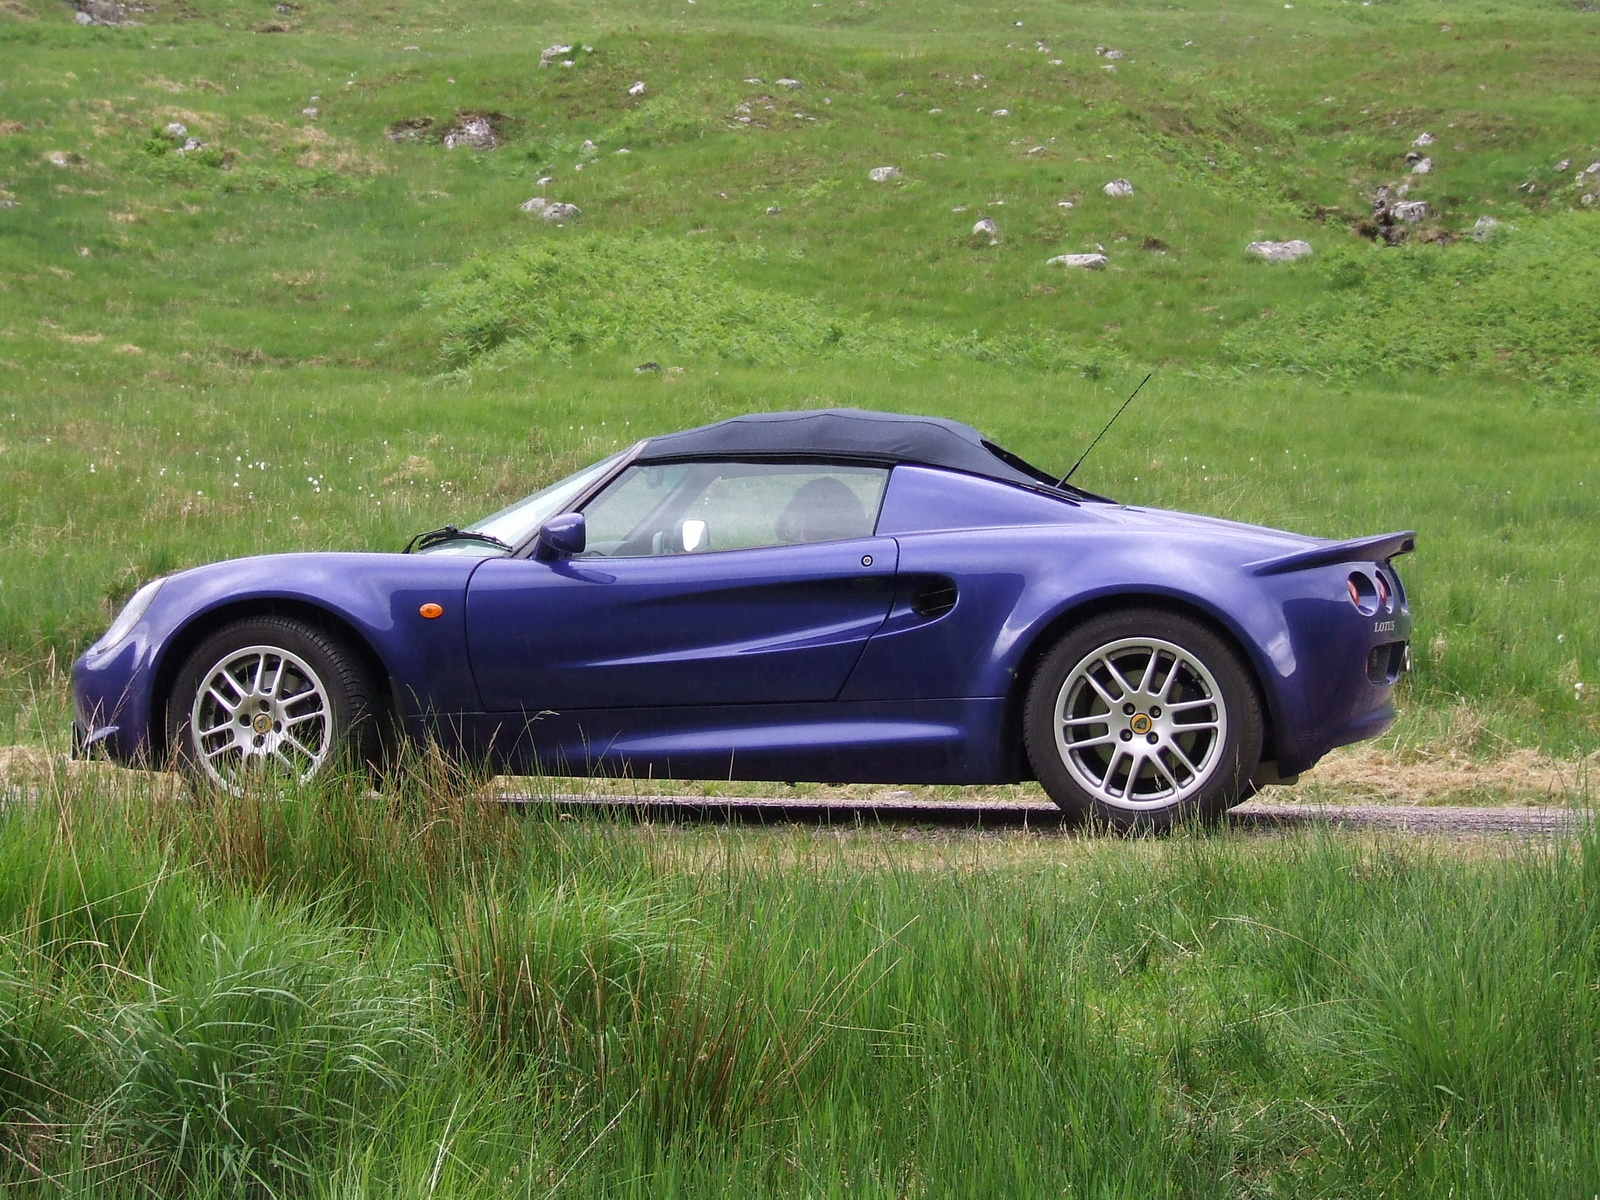 1999 Lotus Elise - Overview - CarGurus